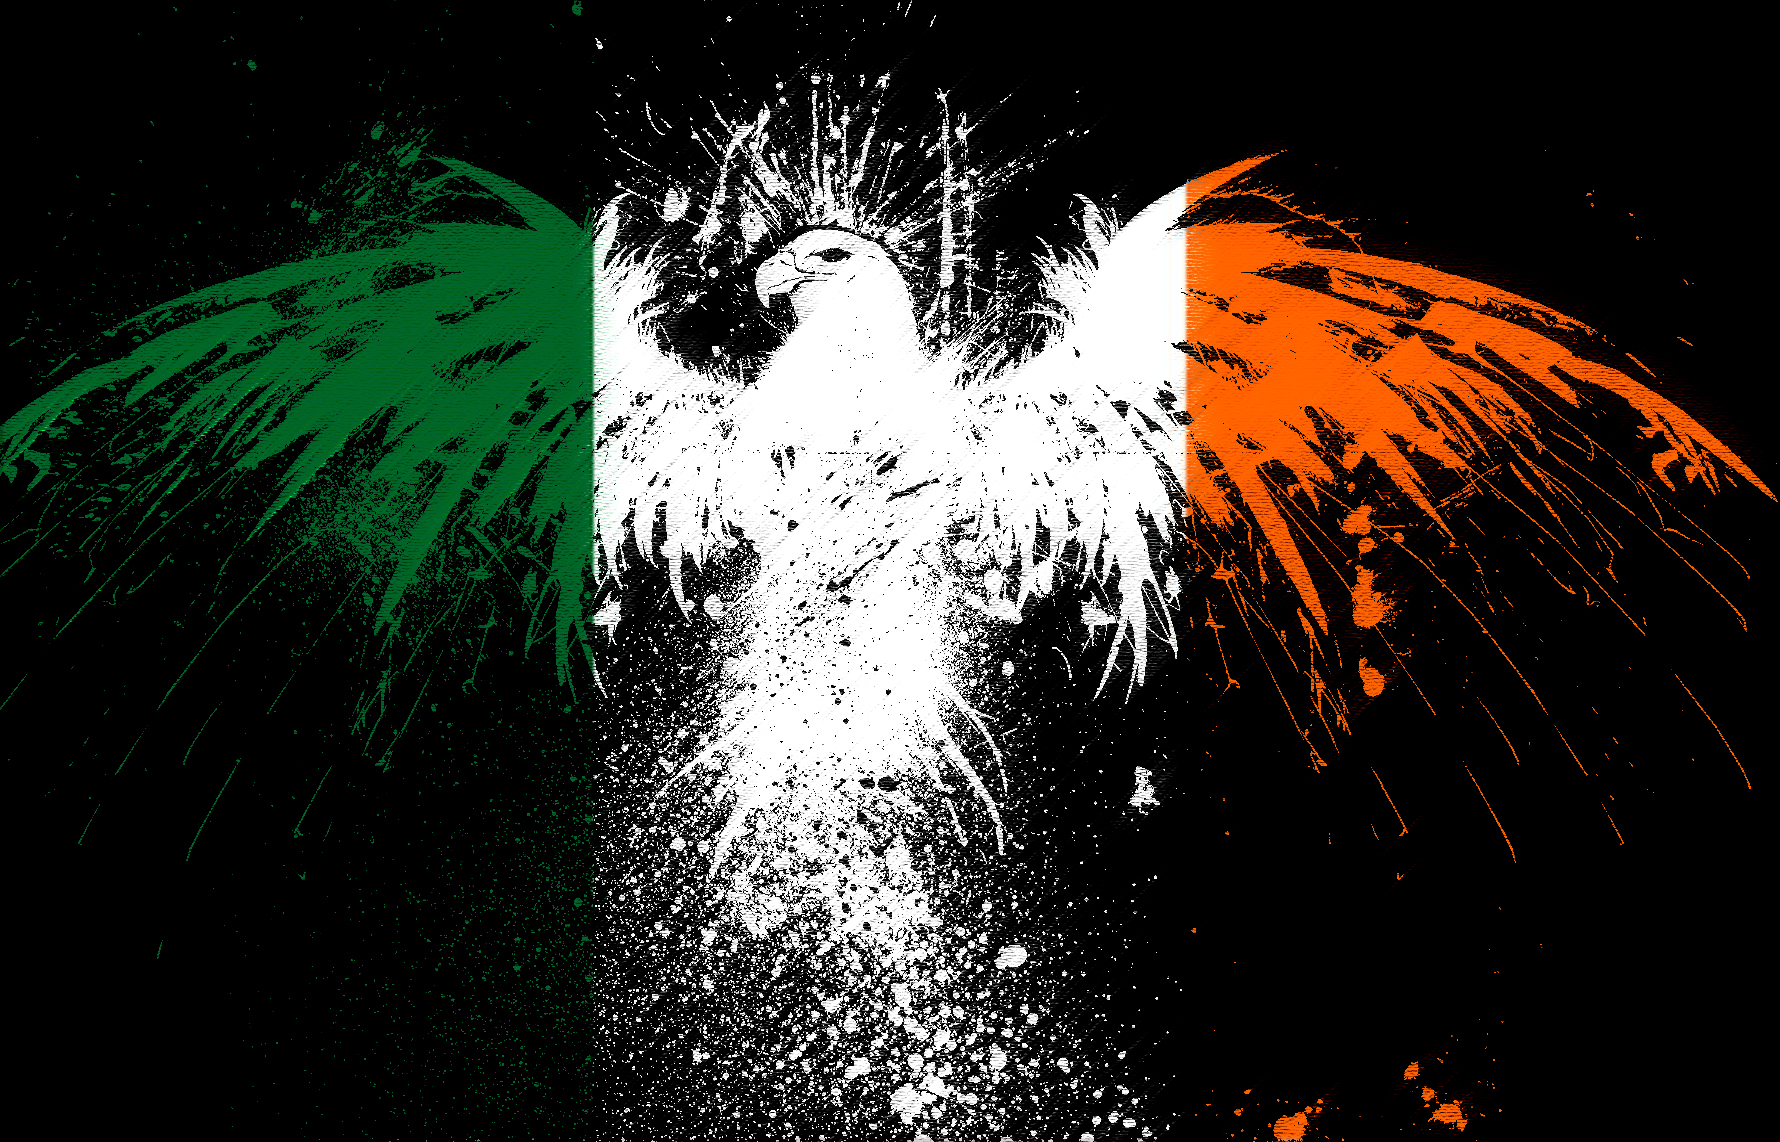 50] Irish Flag Wallpaper for iPhone on WallpaperSafari 1780x1142